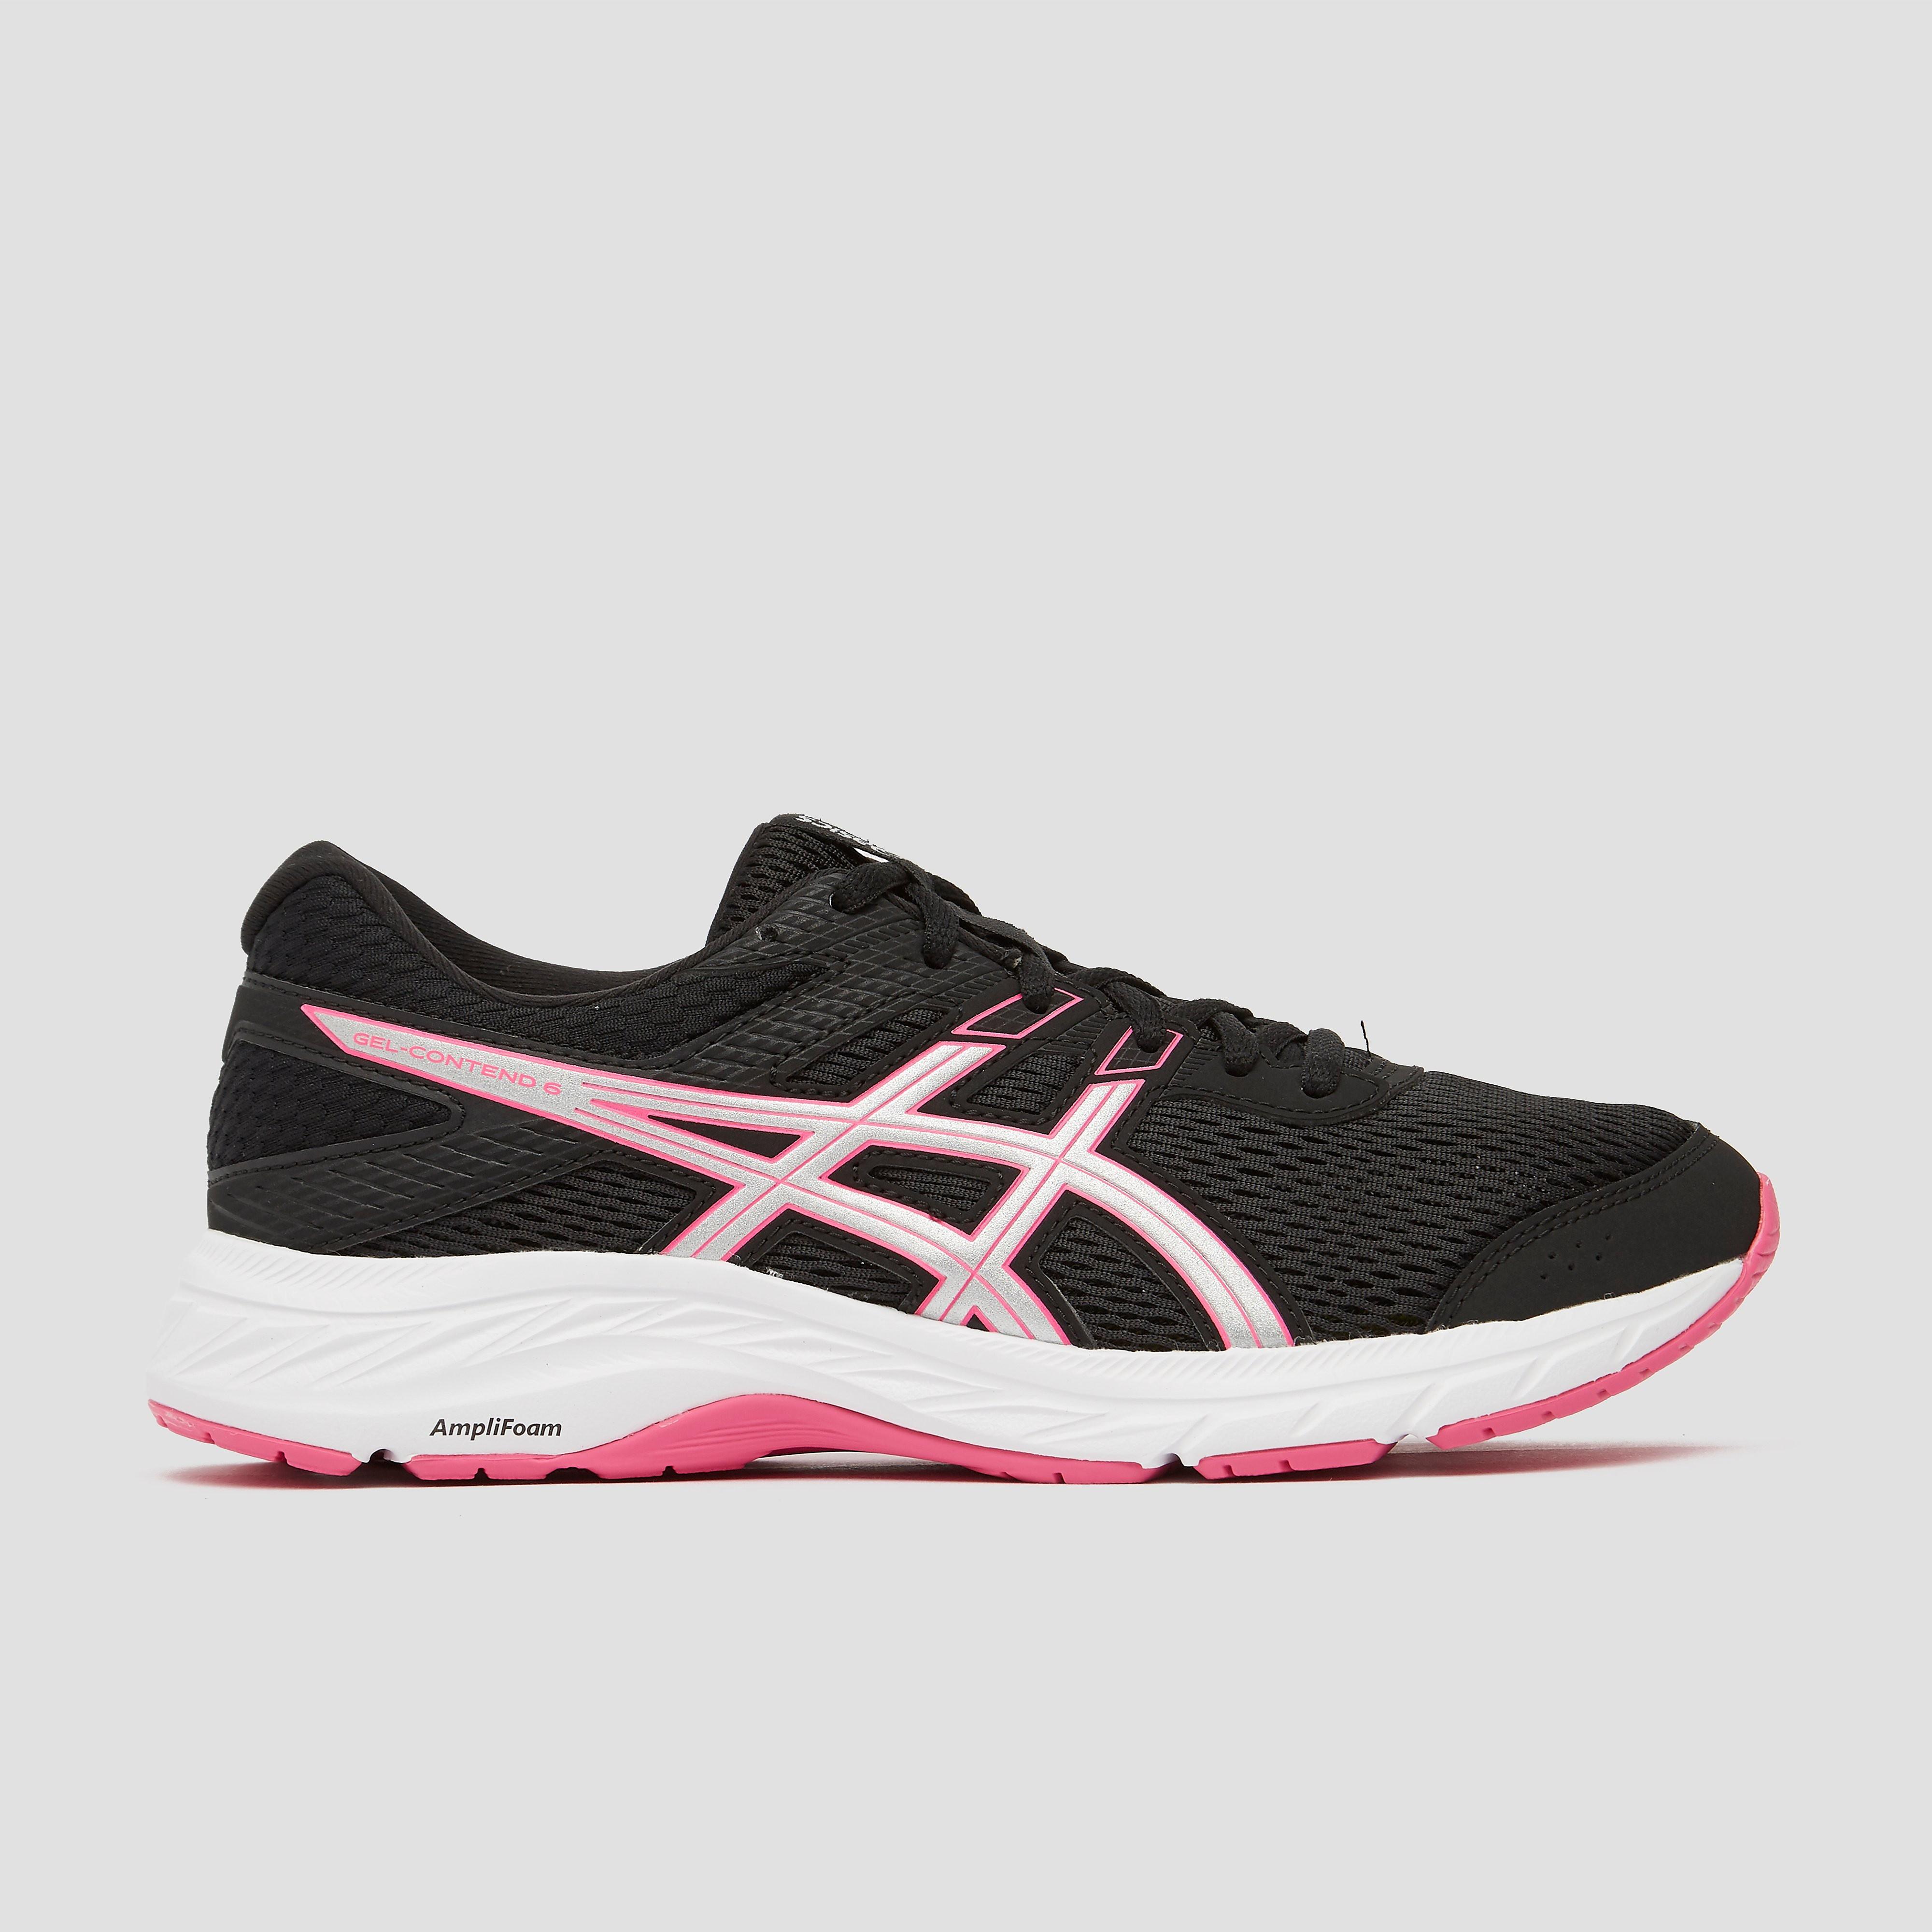 ASICS Gel-contend 6 hardloopschoenen zwart-roze dames Dames